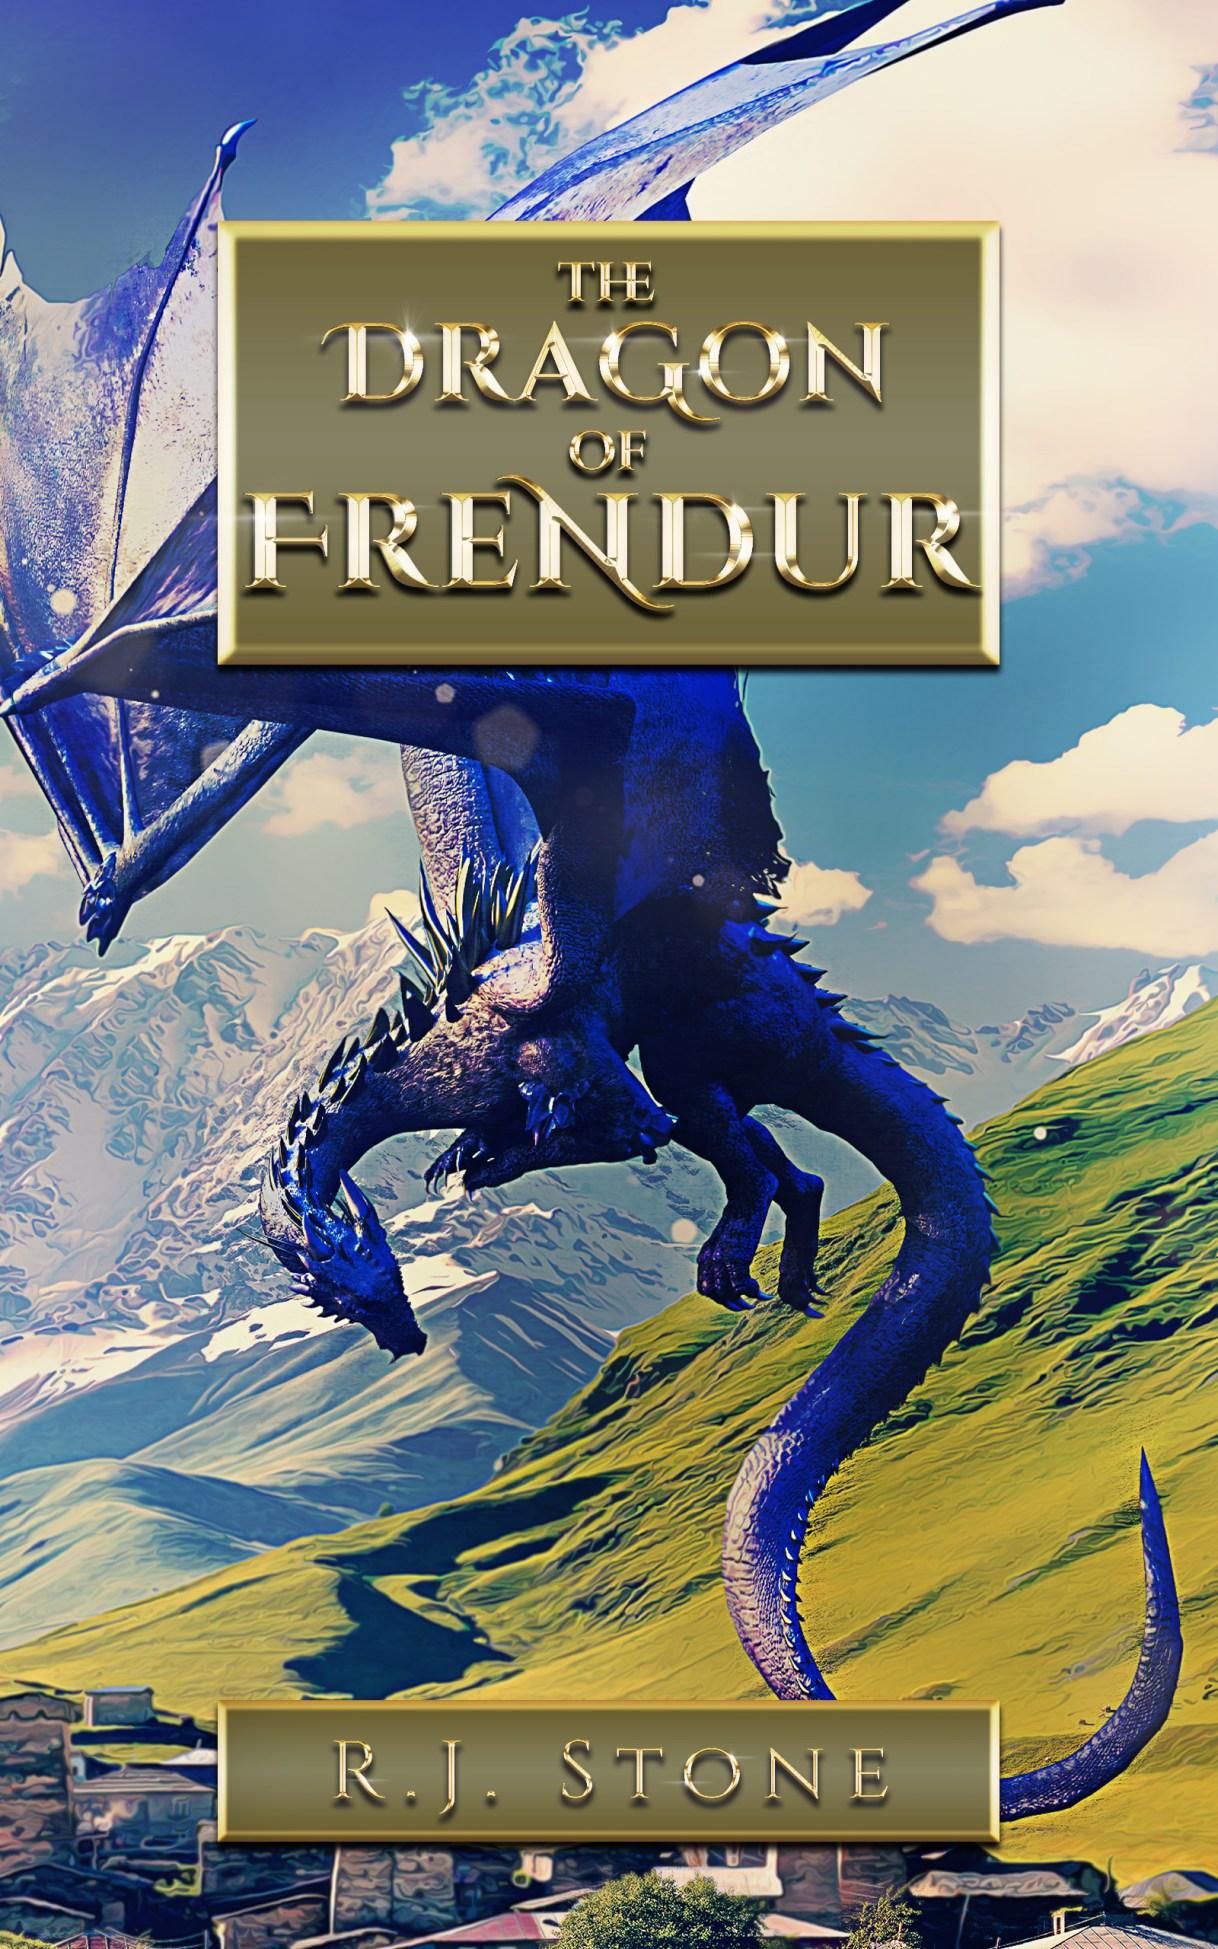 The Dragon of Frendur by R.J. Stone  #dragon #novel #children